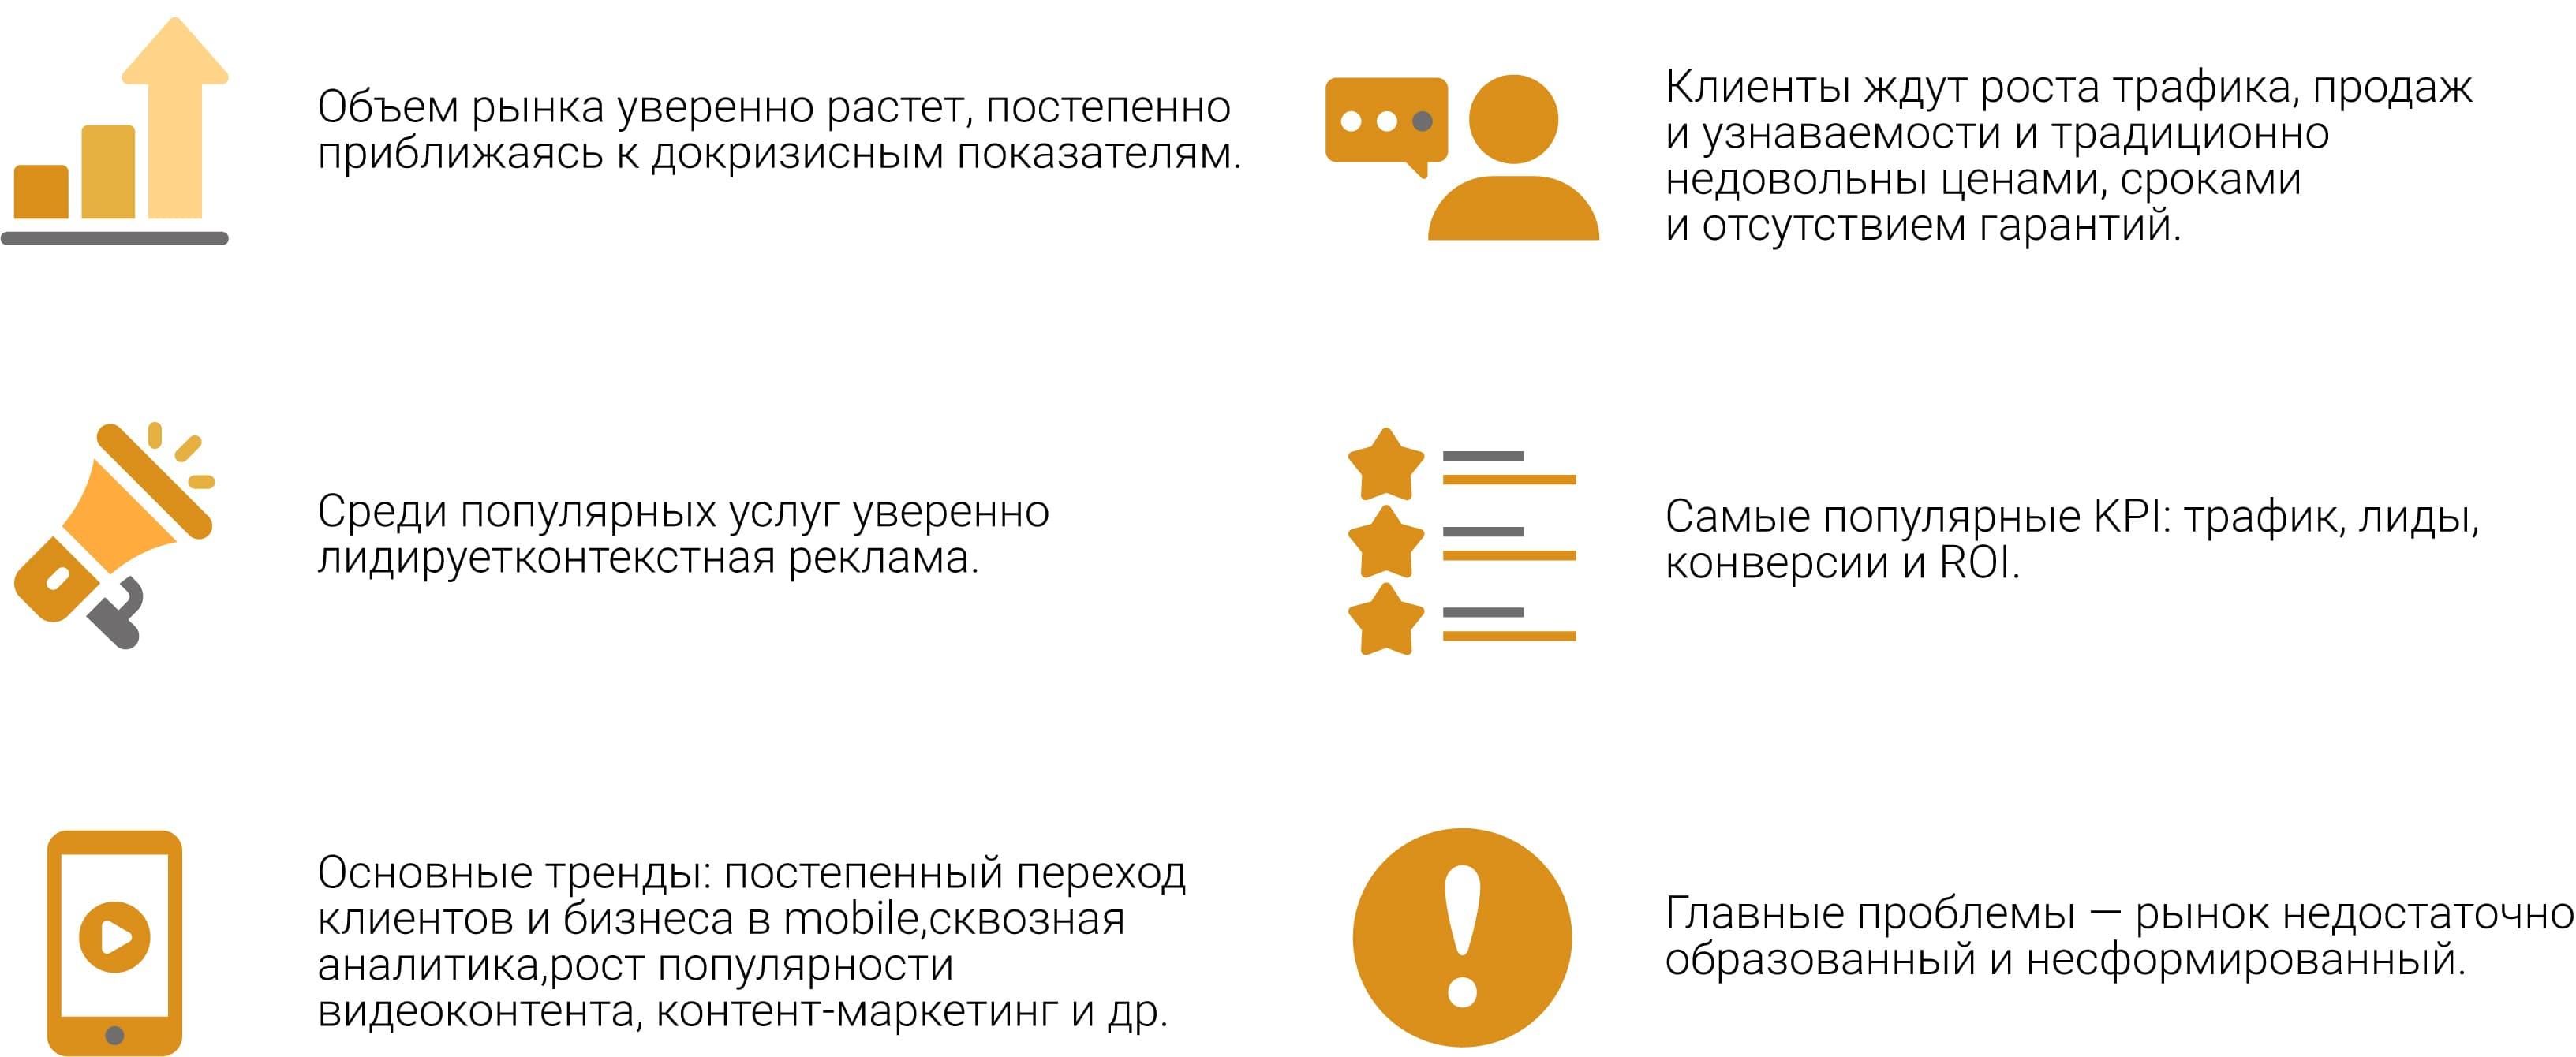 тренды рынка в Украине